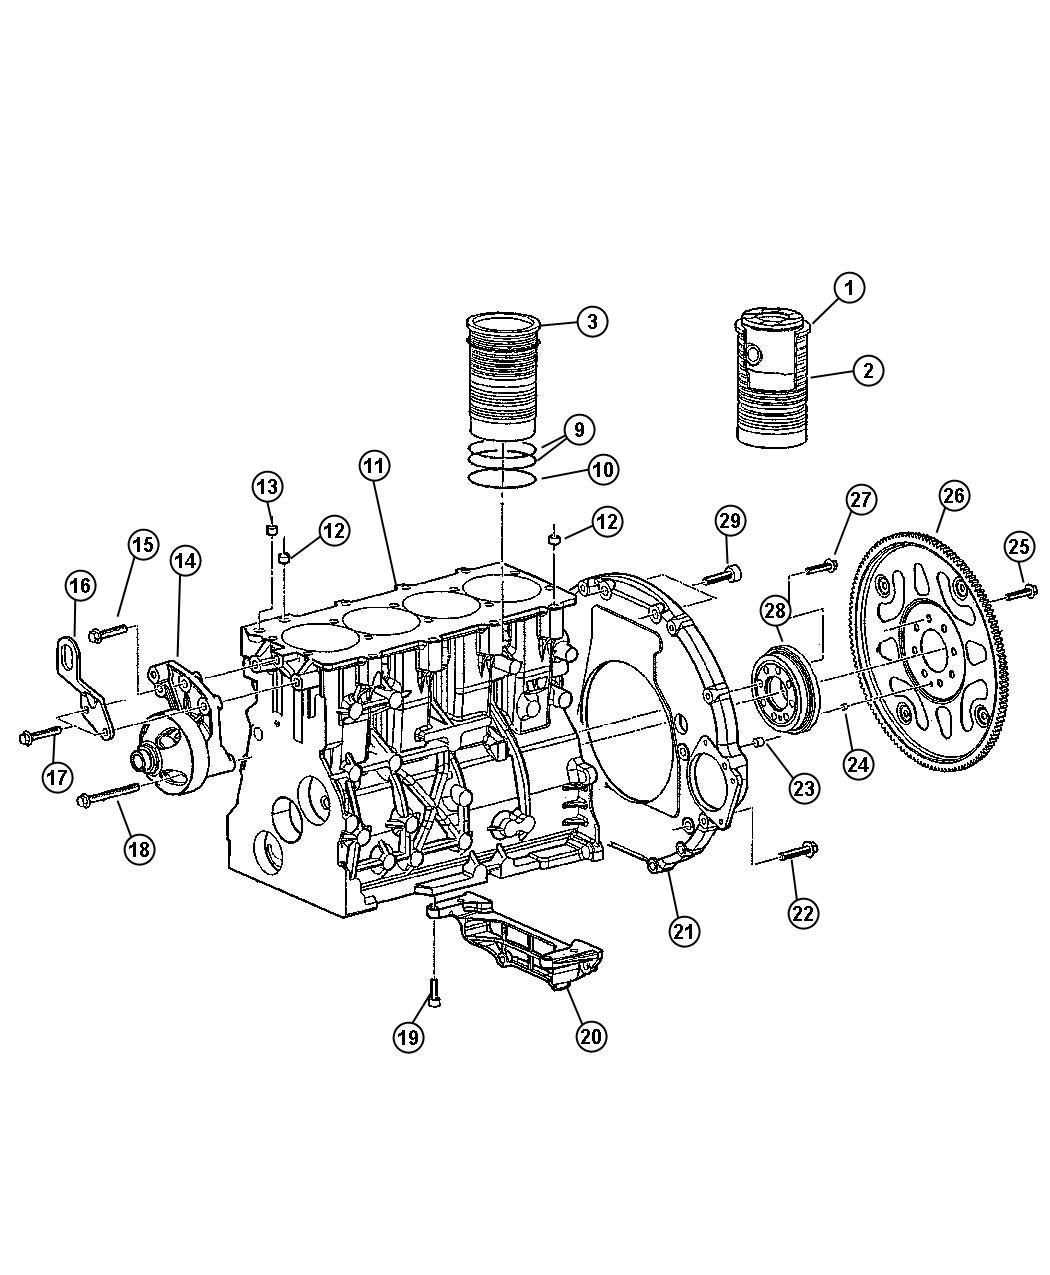 Dodge Ram Plate Torque Converter Drivesel